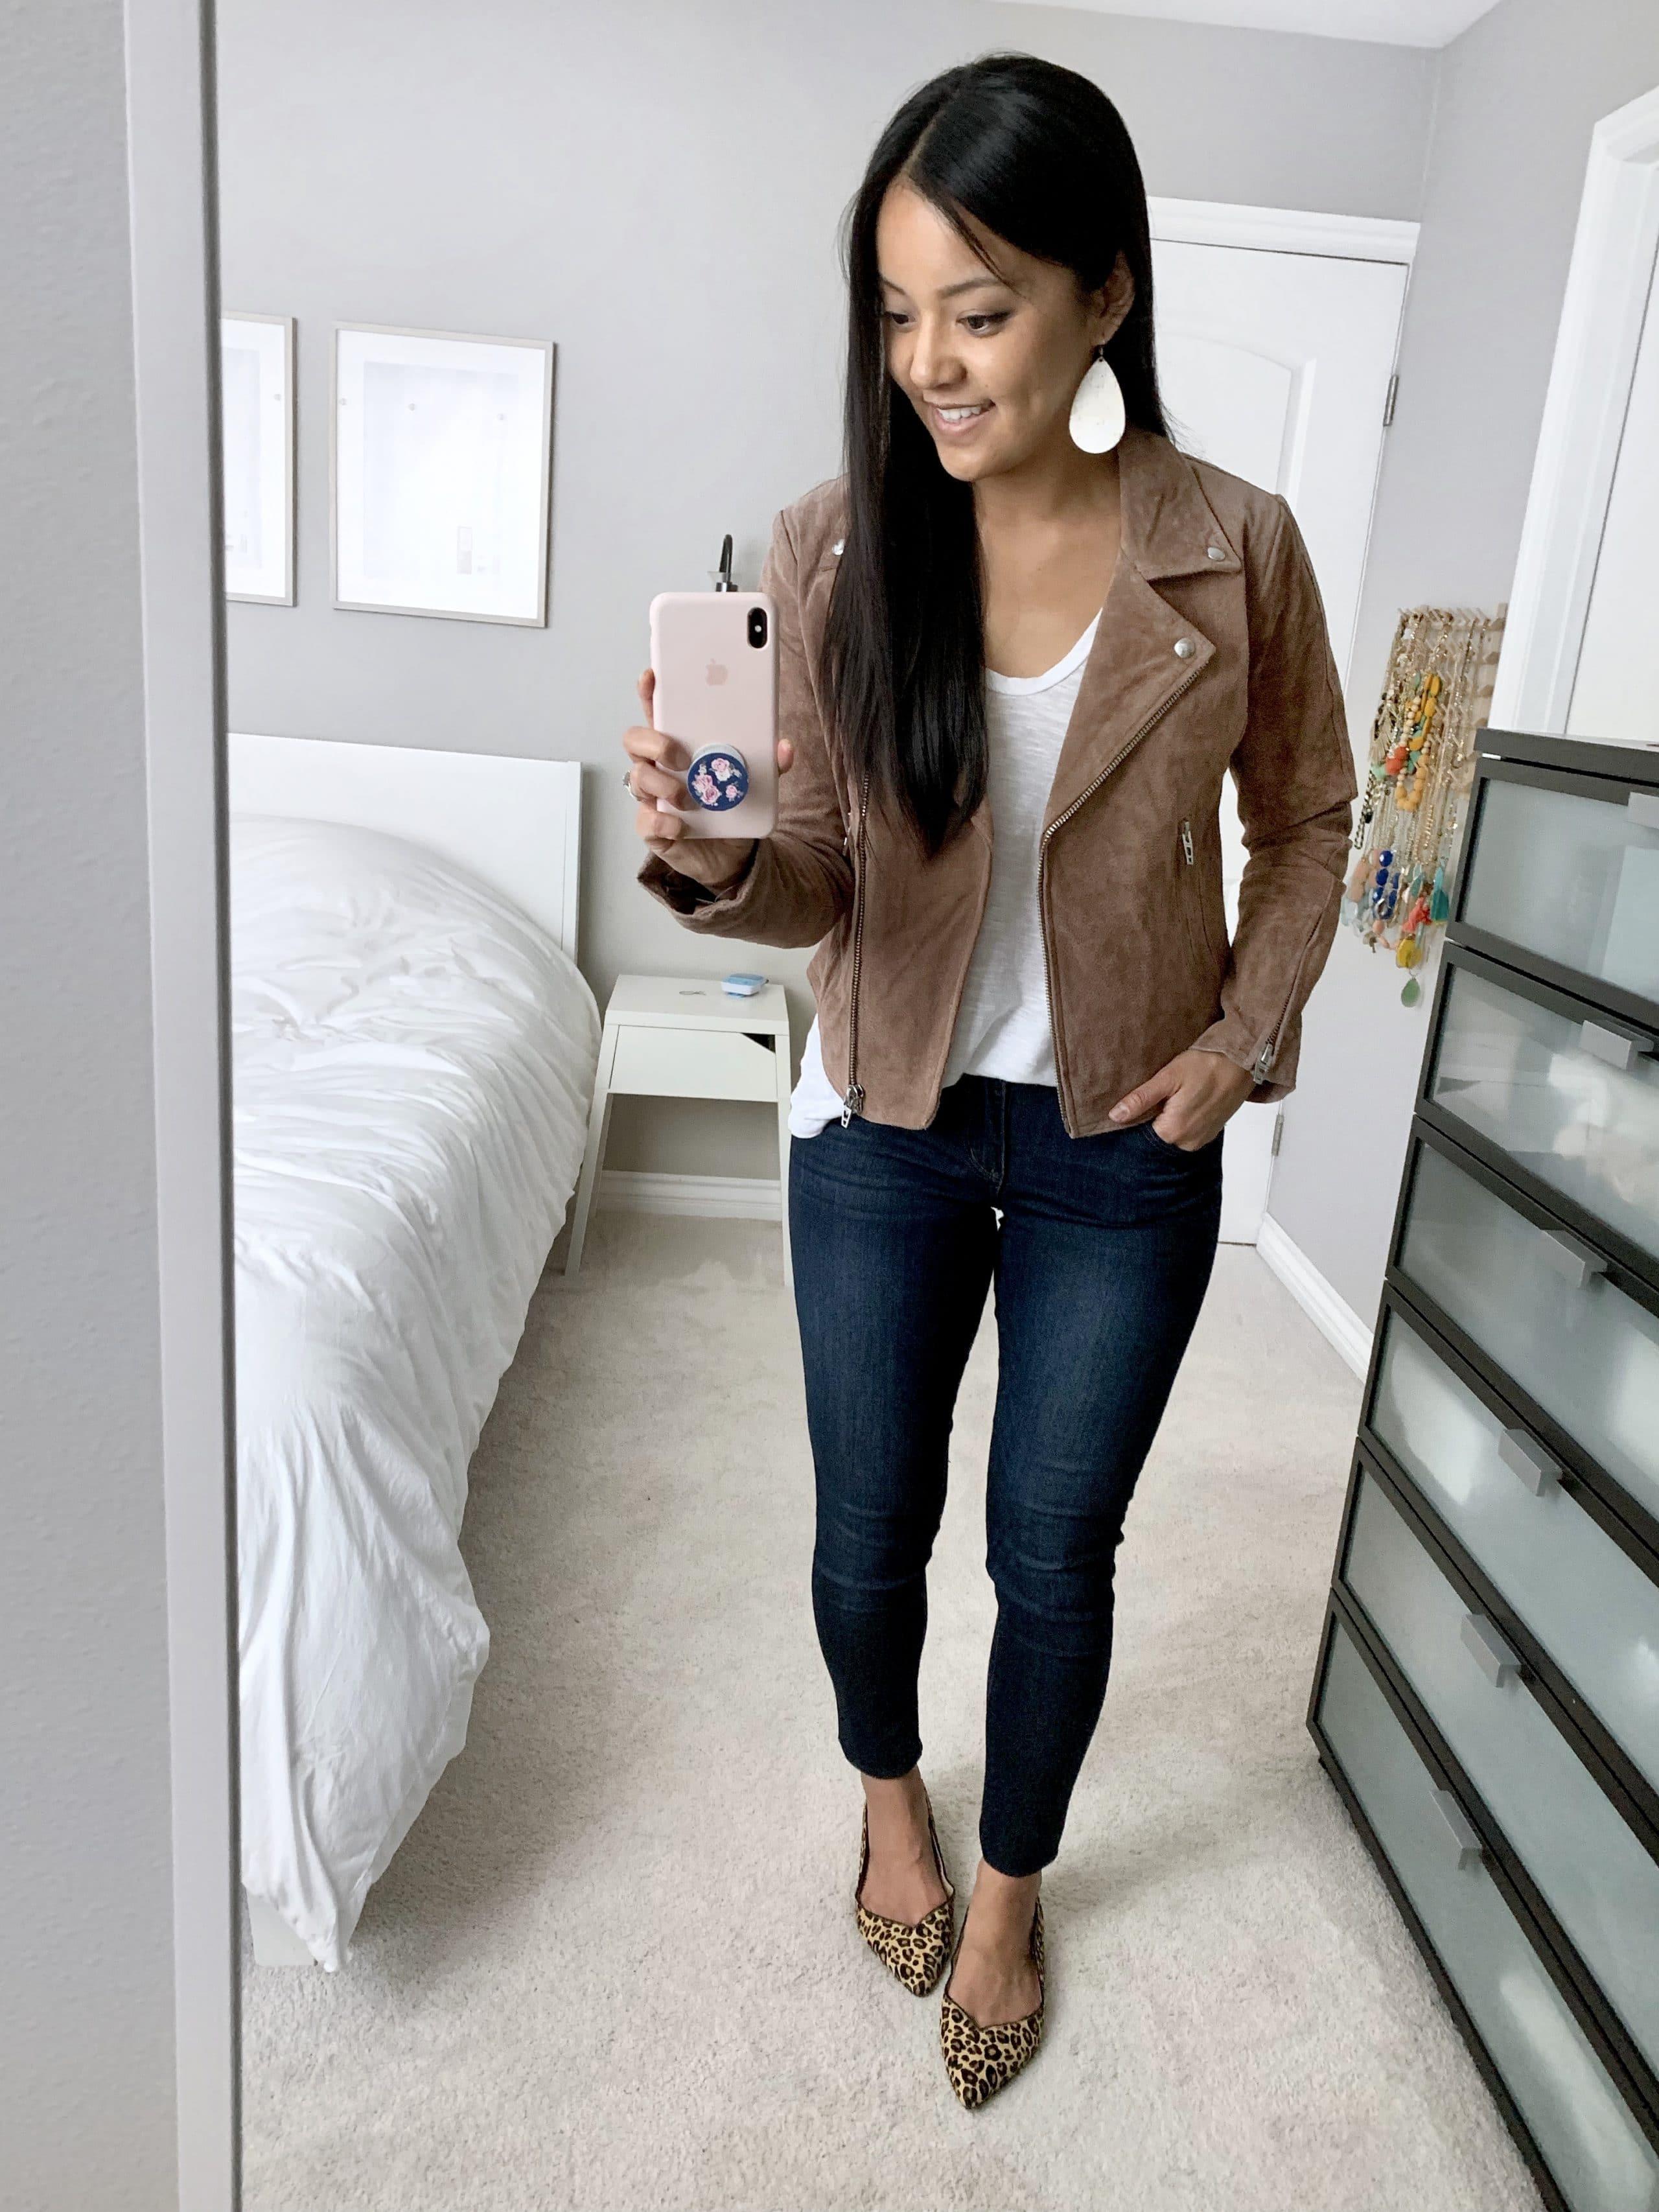 suede moto jacket + white tee + jeans + leopard print flats